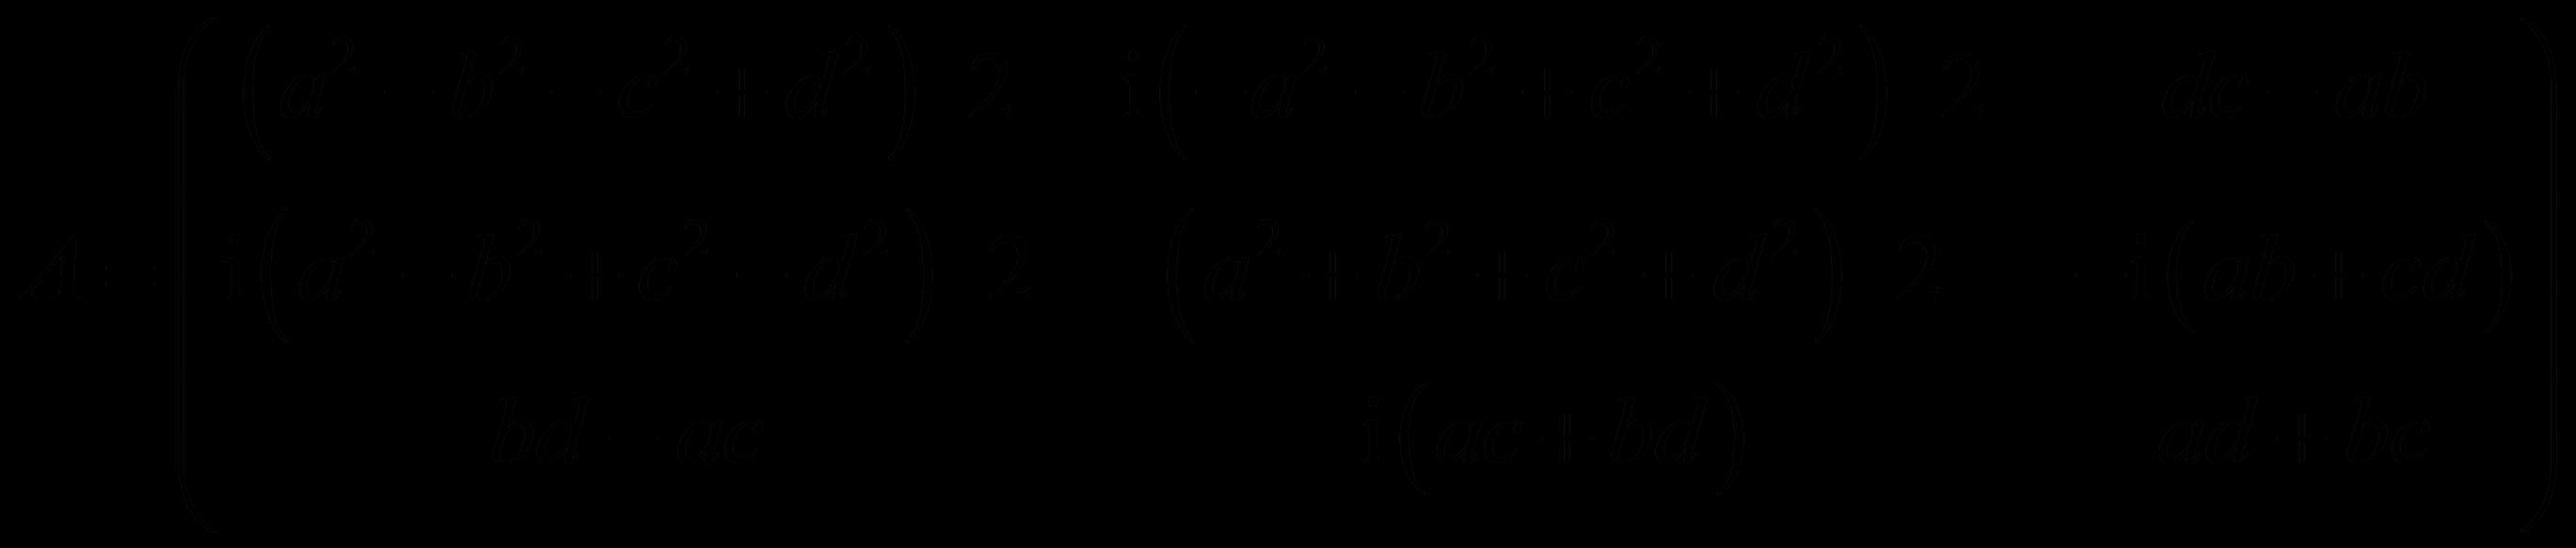 CK4.png